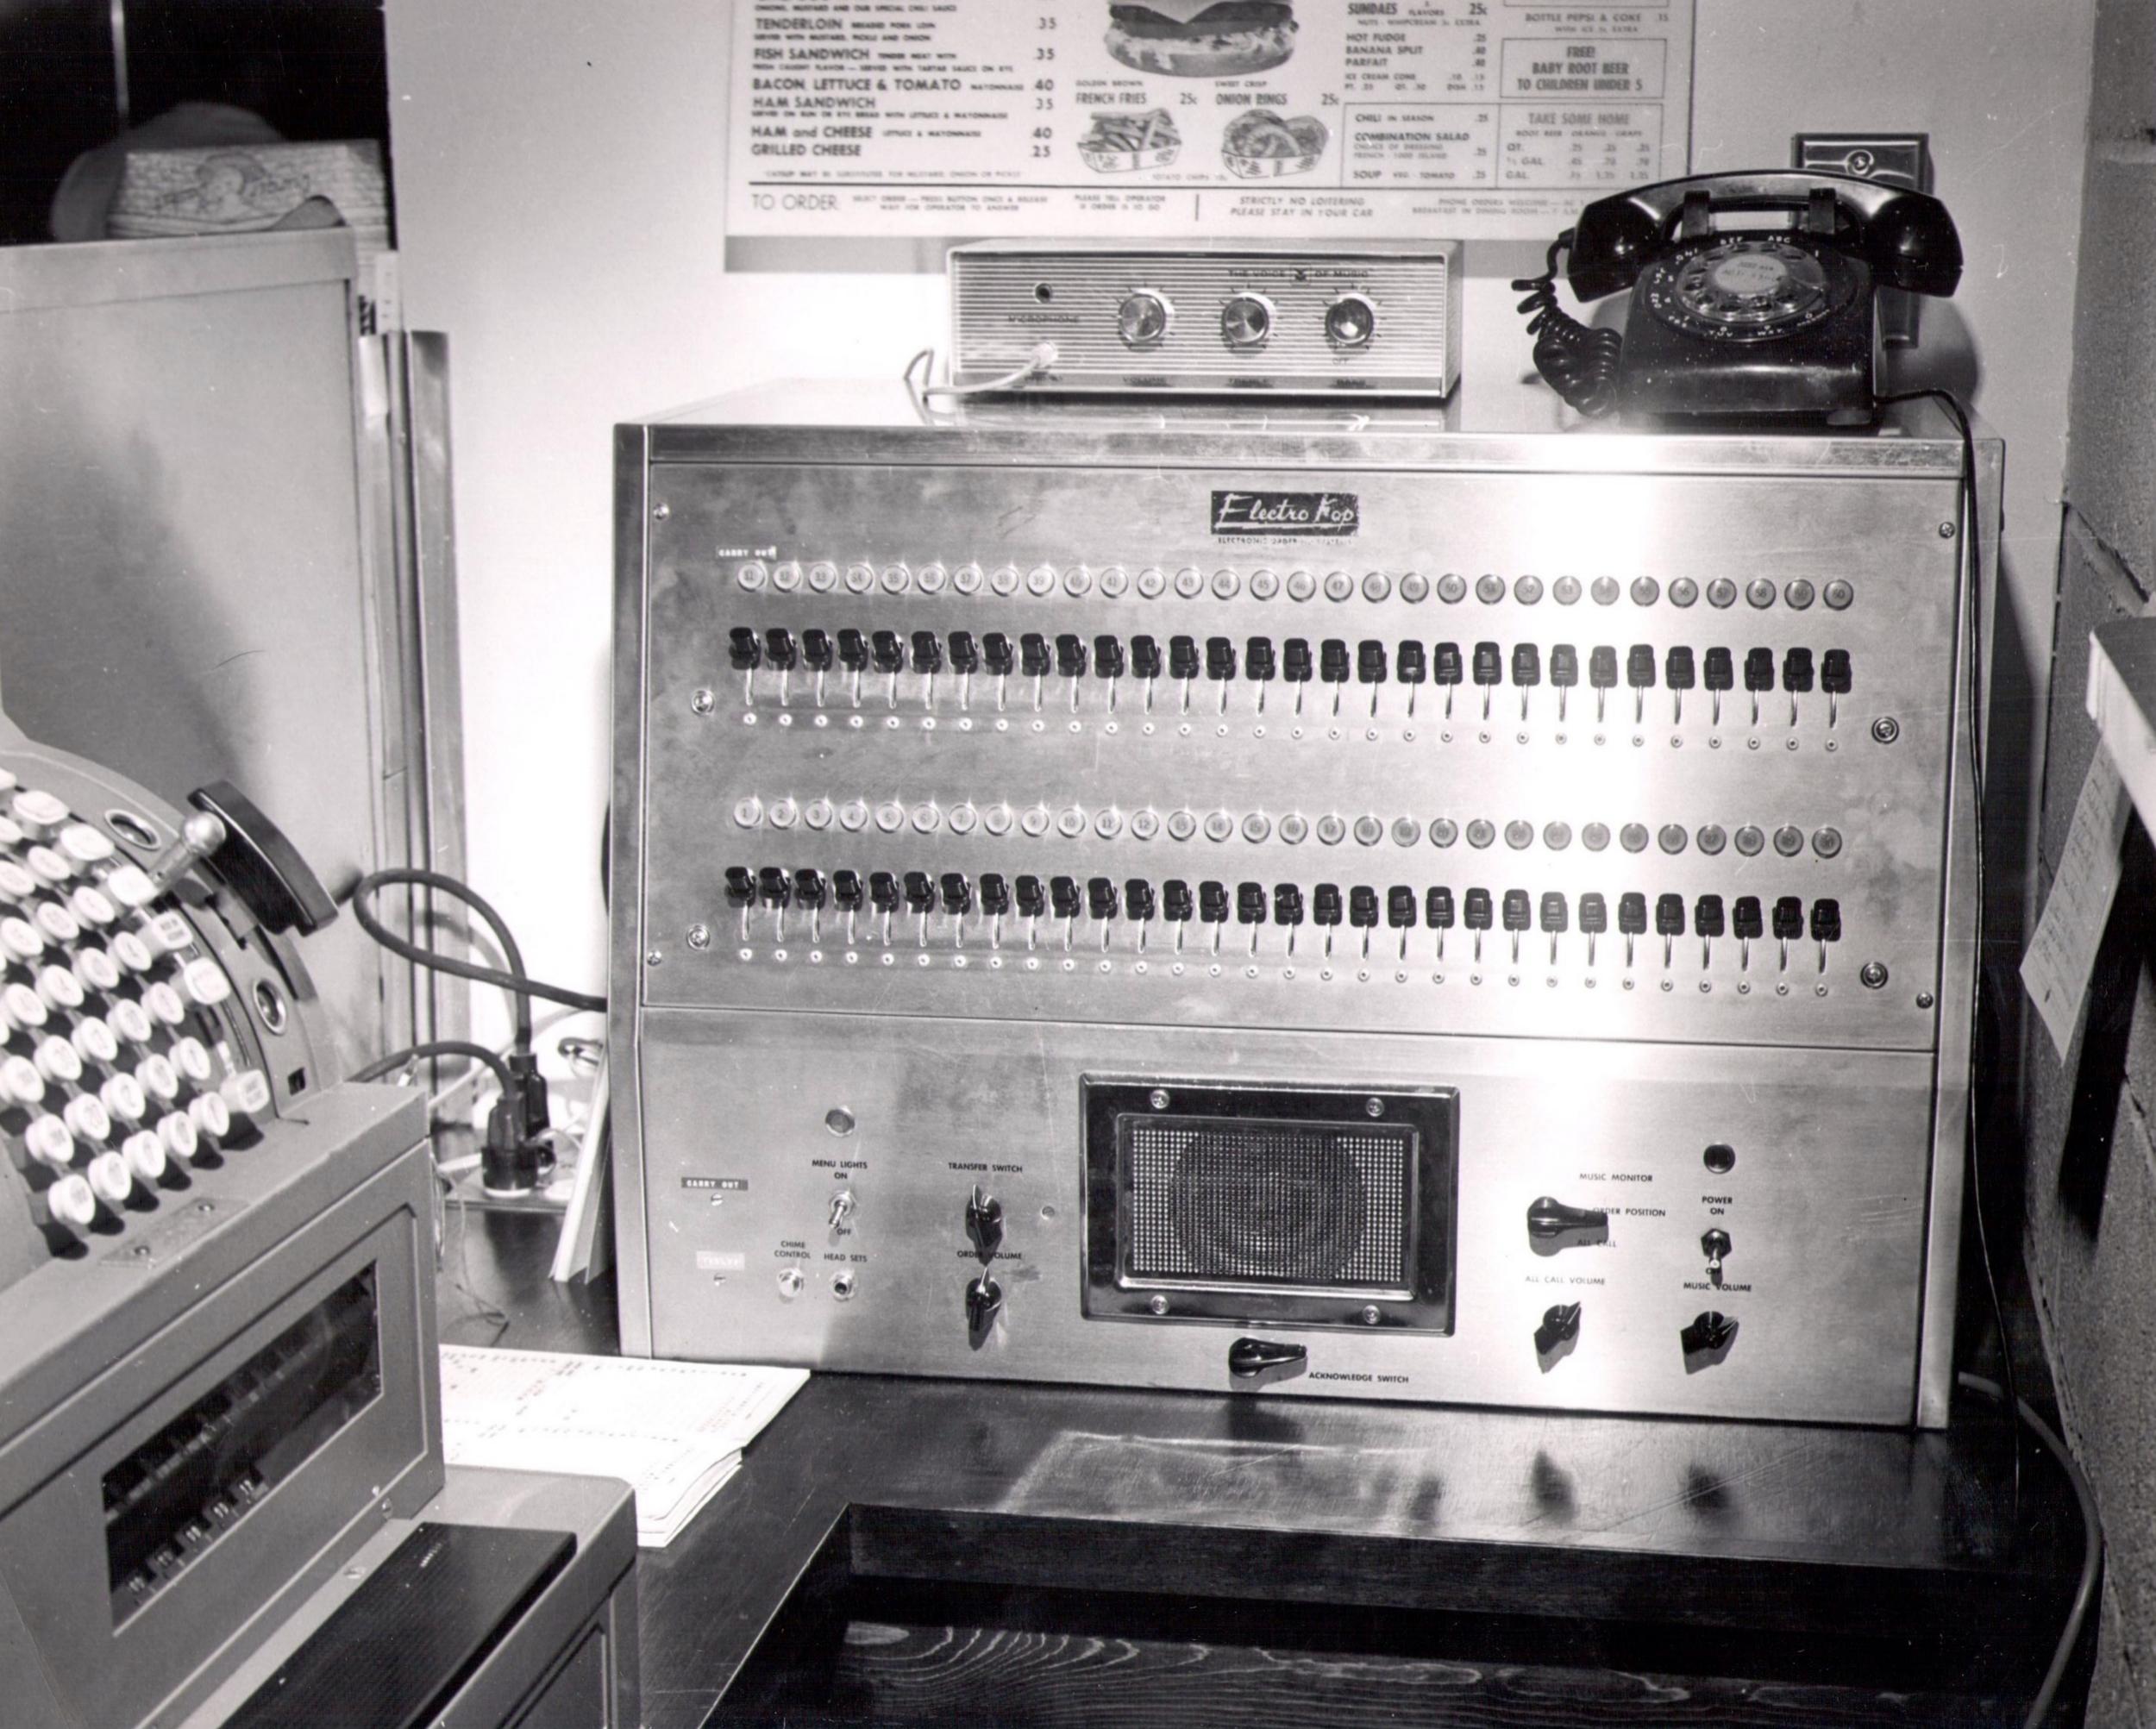 Electrohop - Mark Twain Dinette - Hannibal, MO Restaurant and DIner